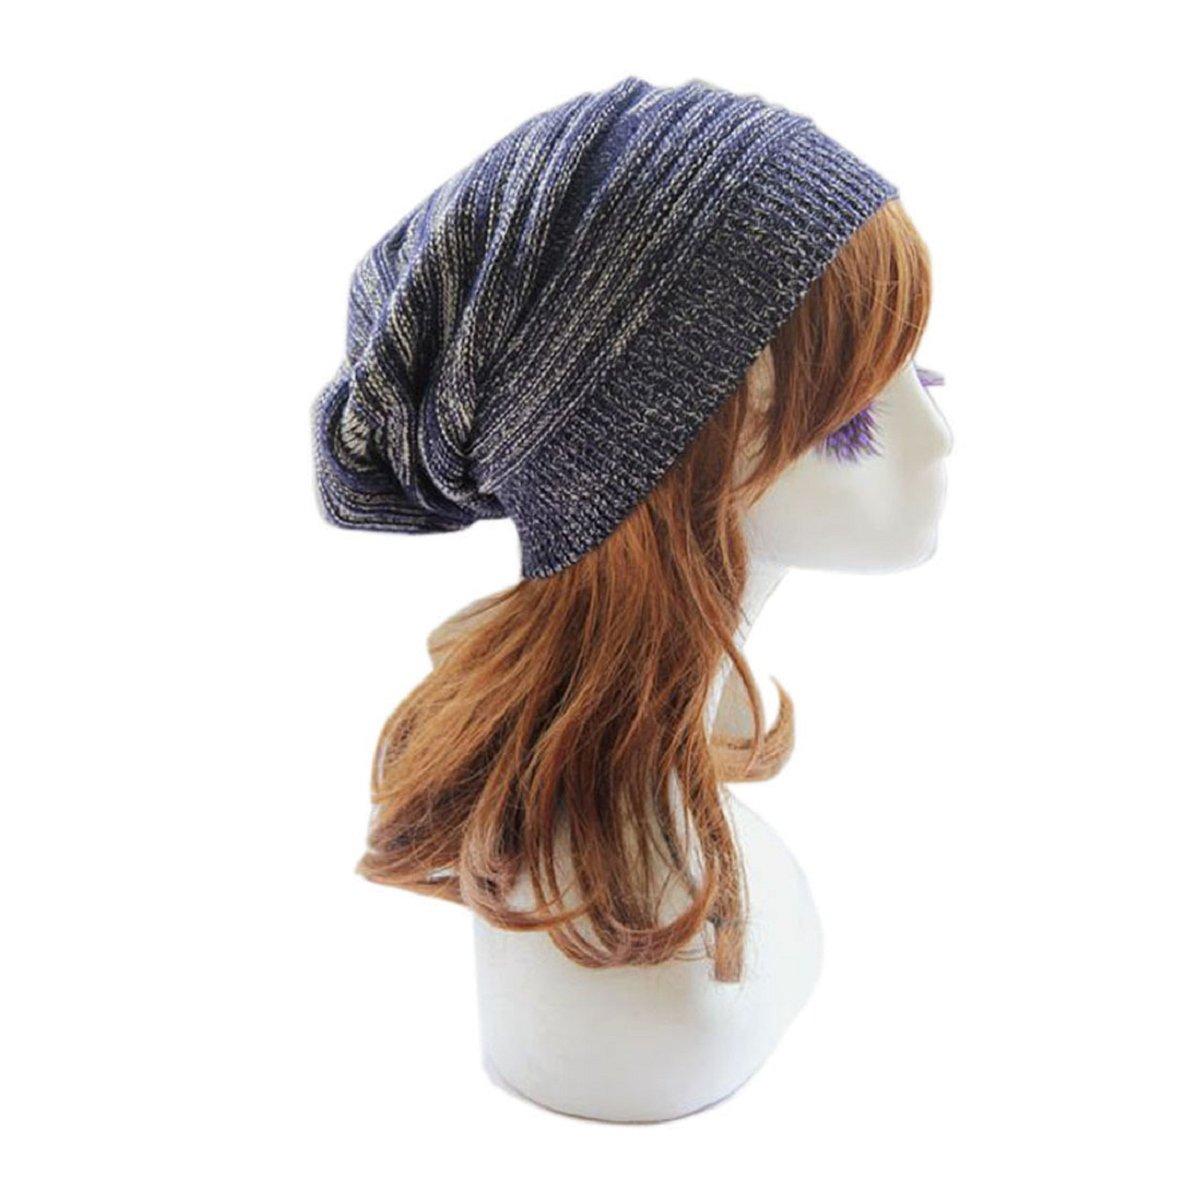 Sandistore Unisex Knit Baggy Beanie Beret Winter Warm Oversized Ski Cap Hat (Blue)